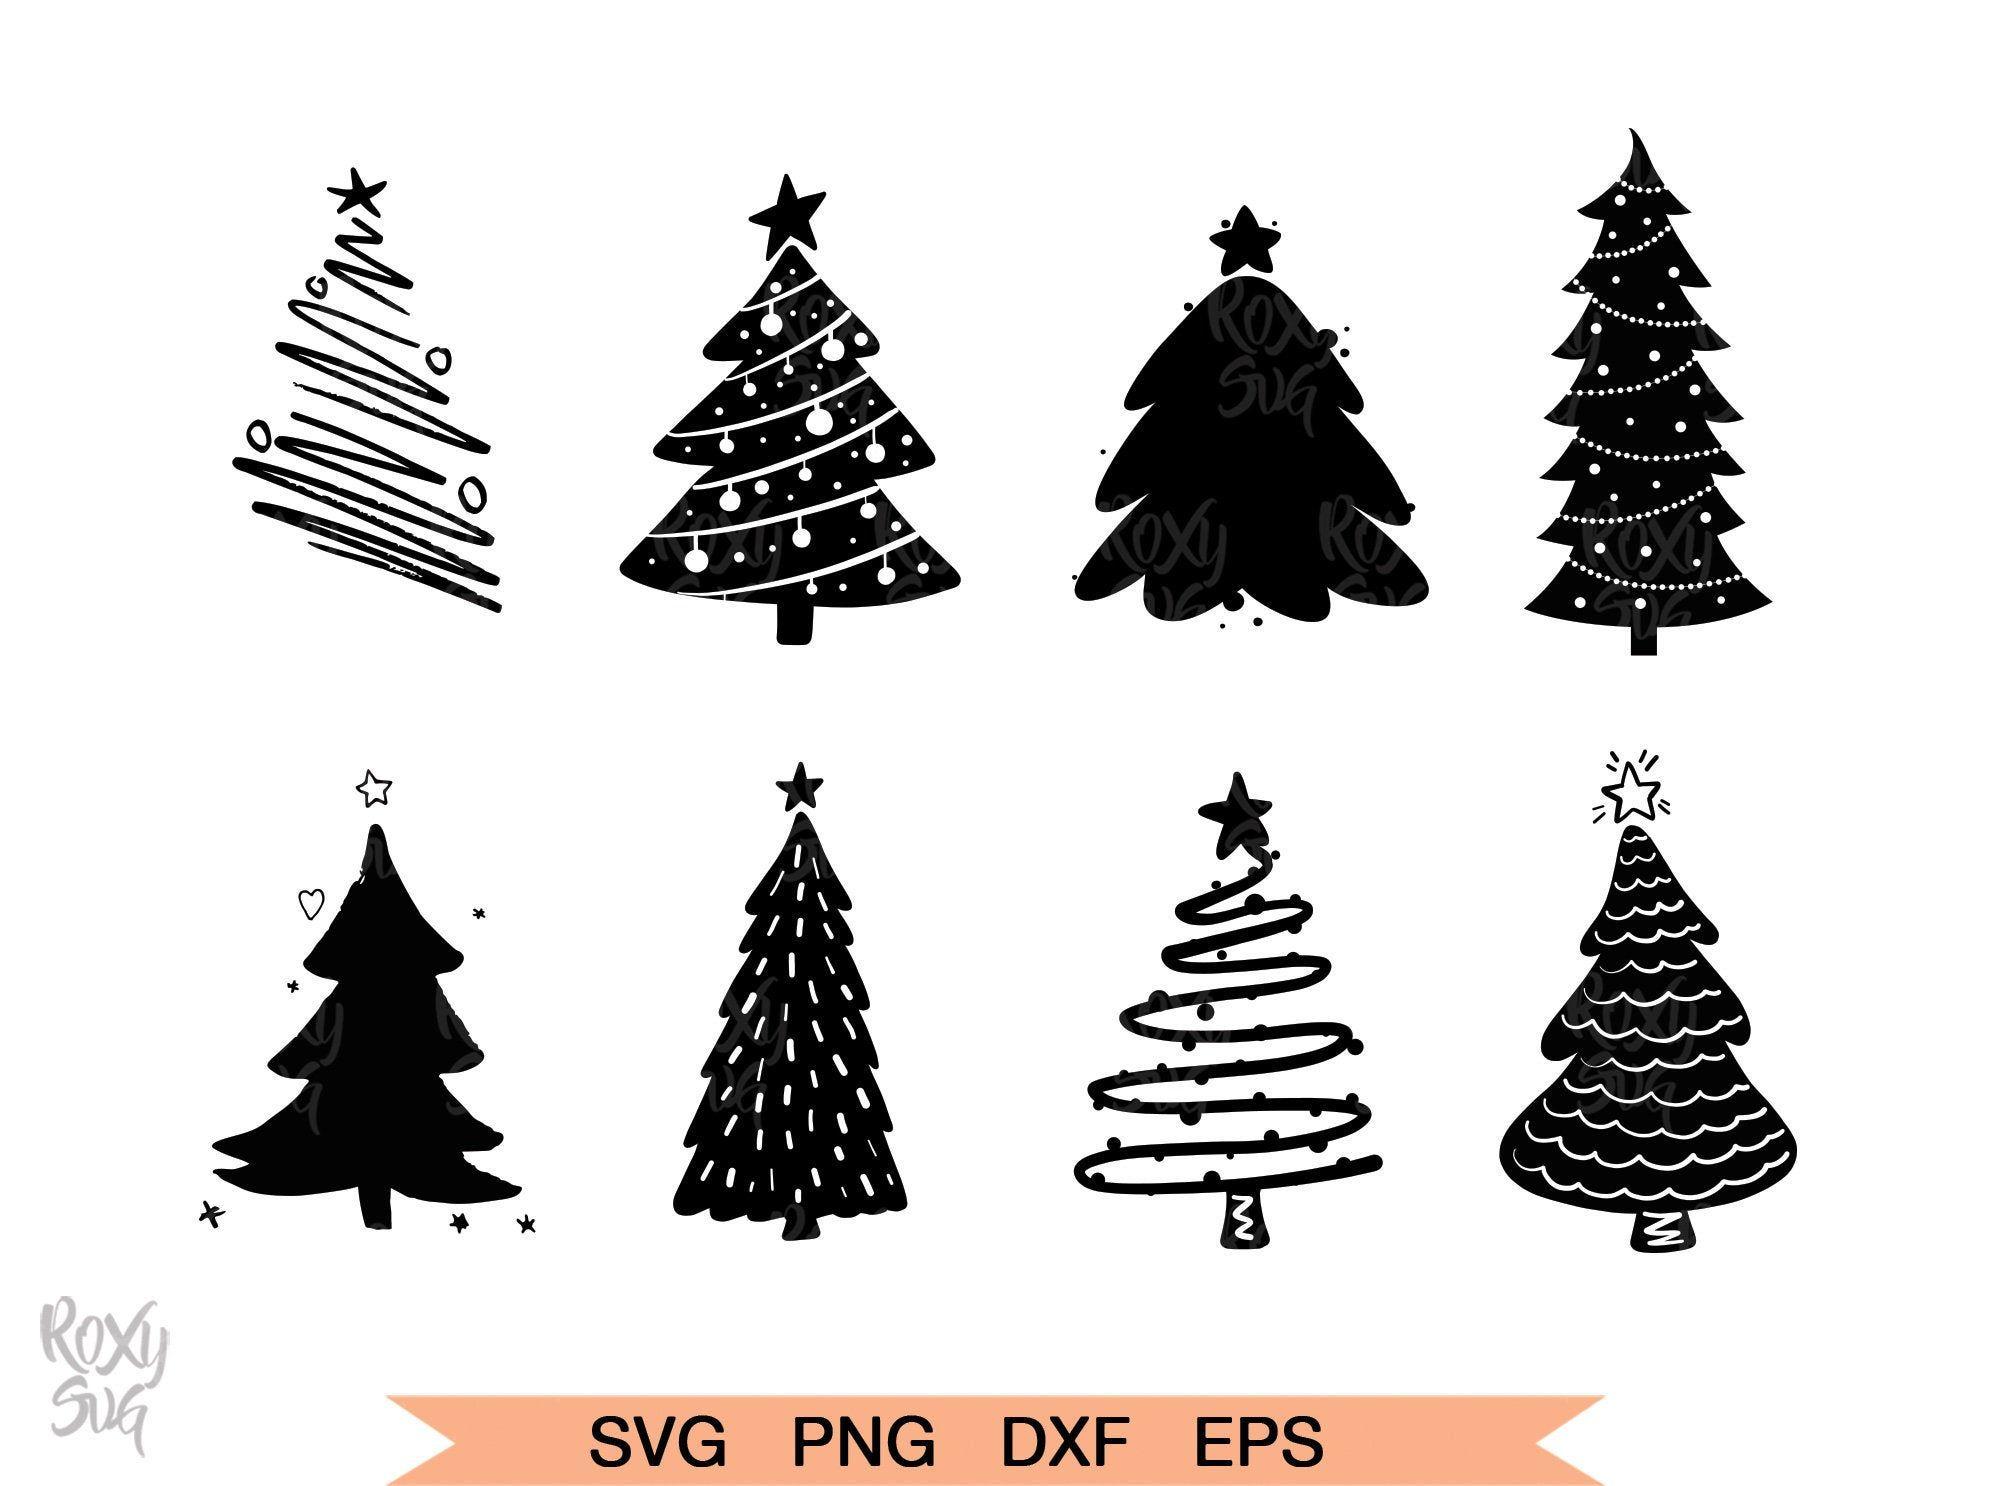 Christmas Tree Svg Christmas Svg Christmas Tree Silhouette Etsy Christmas Tree Silhouette Christmas Tree Clipart Christmas Svg